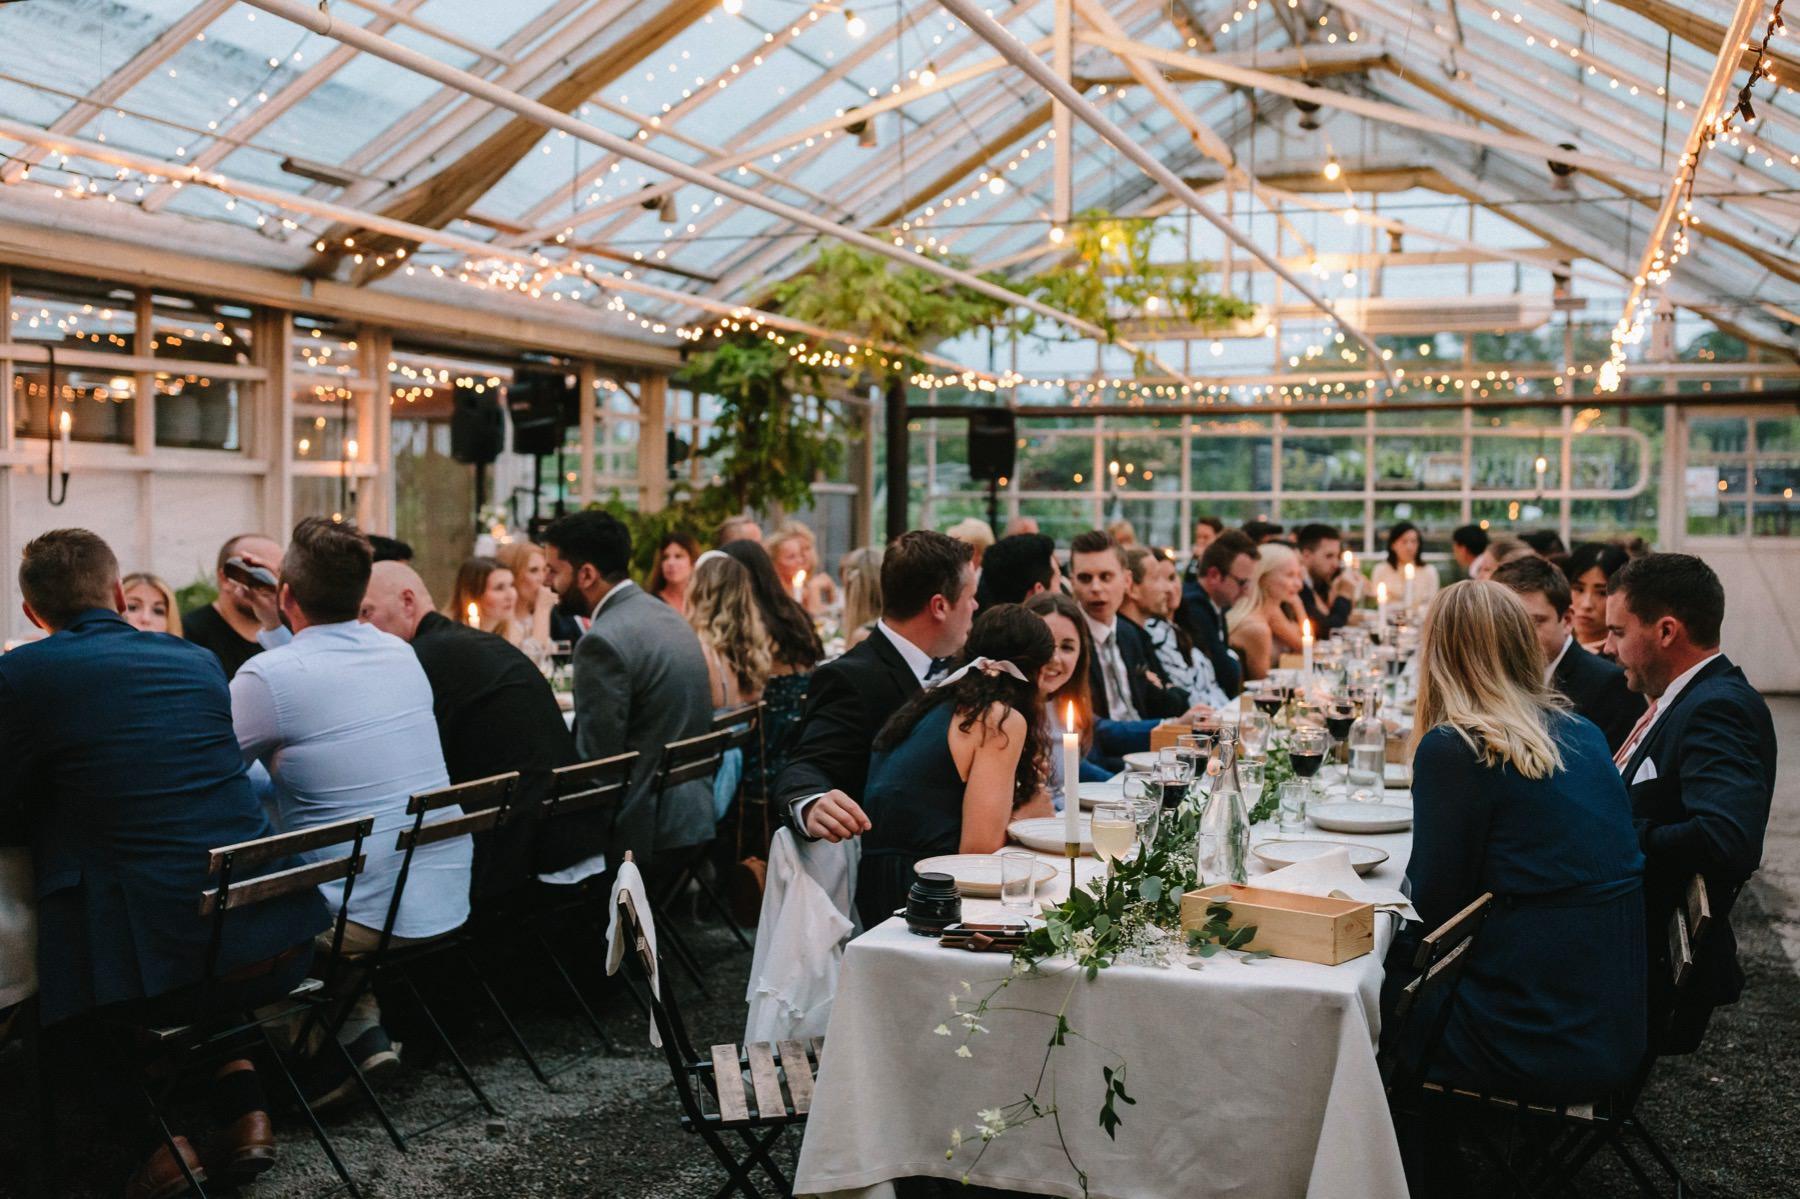 getting married at rosendals trädgård